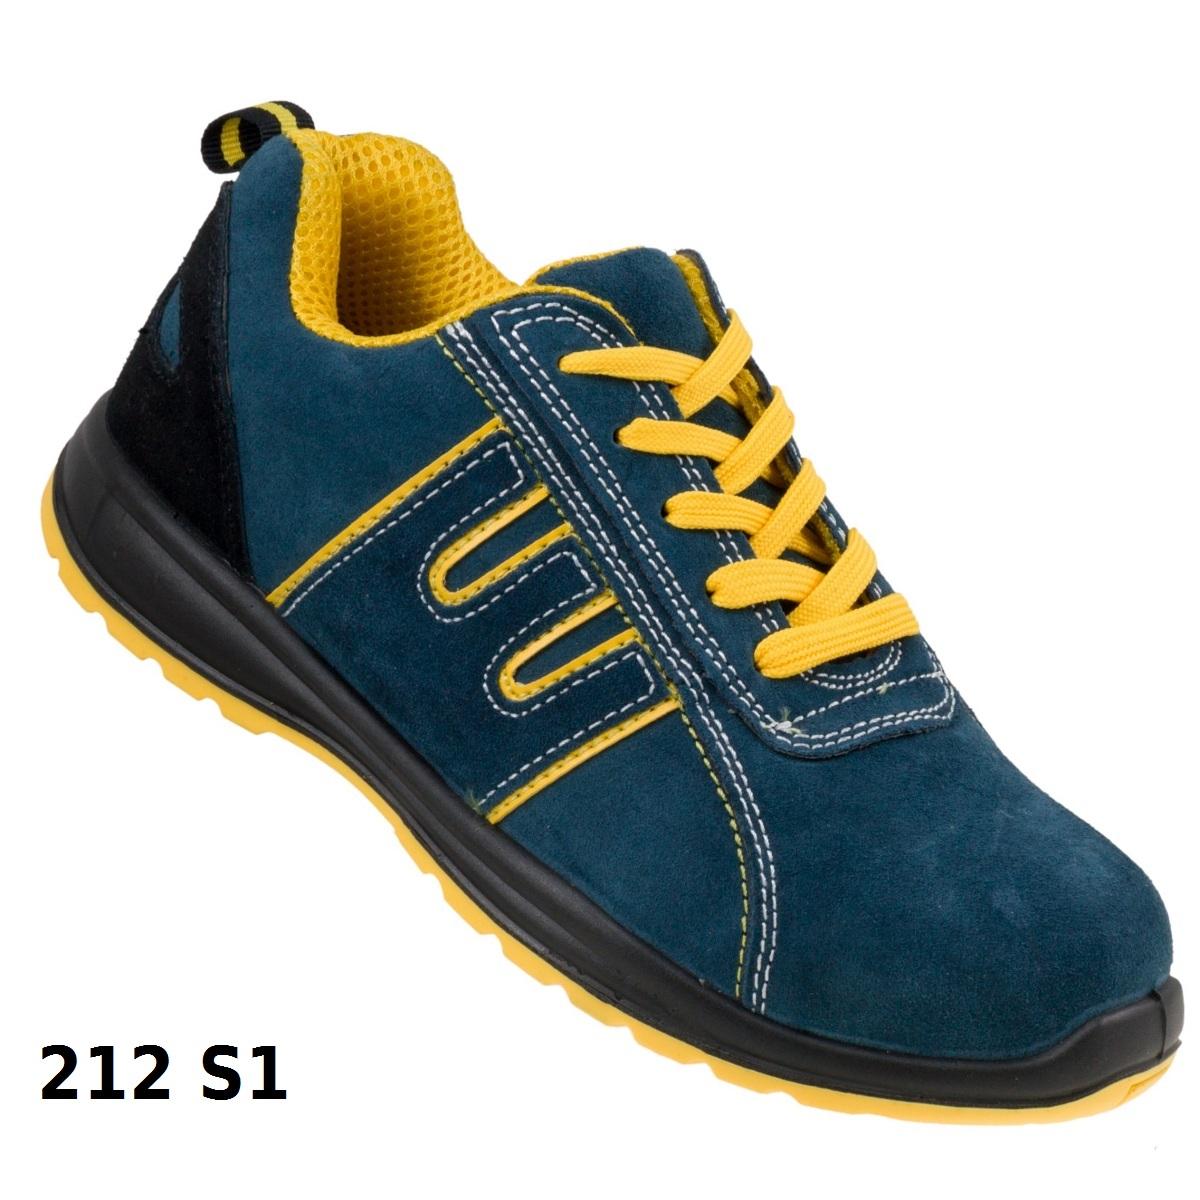 urgent safety shoes shoe work steel toe cap boots 1 pair of socks gratis new ebay. Black Bedroom Furniture Sets. Home Design Ideas